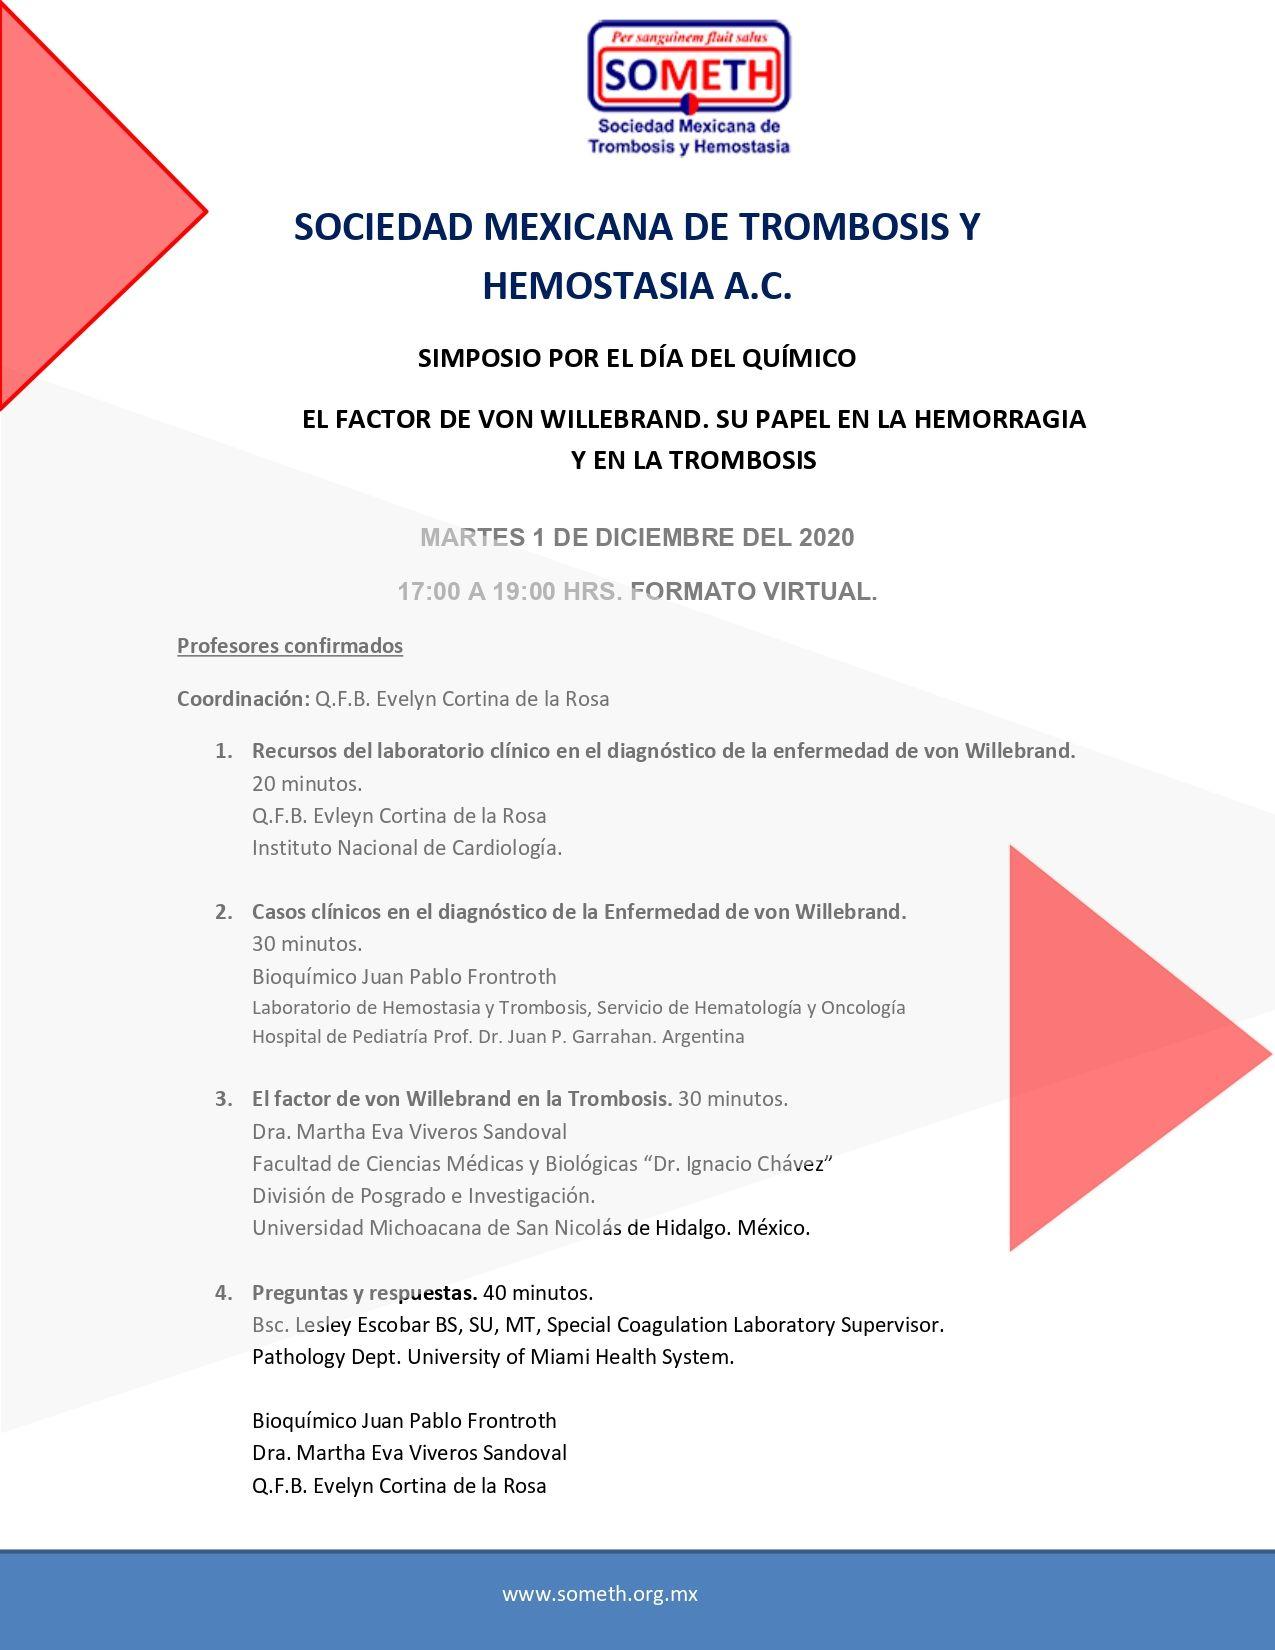 Programa Dia del quimico 2020 SOMETH 1 page 0001